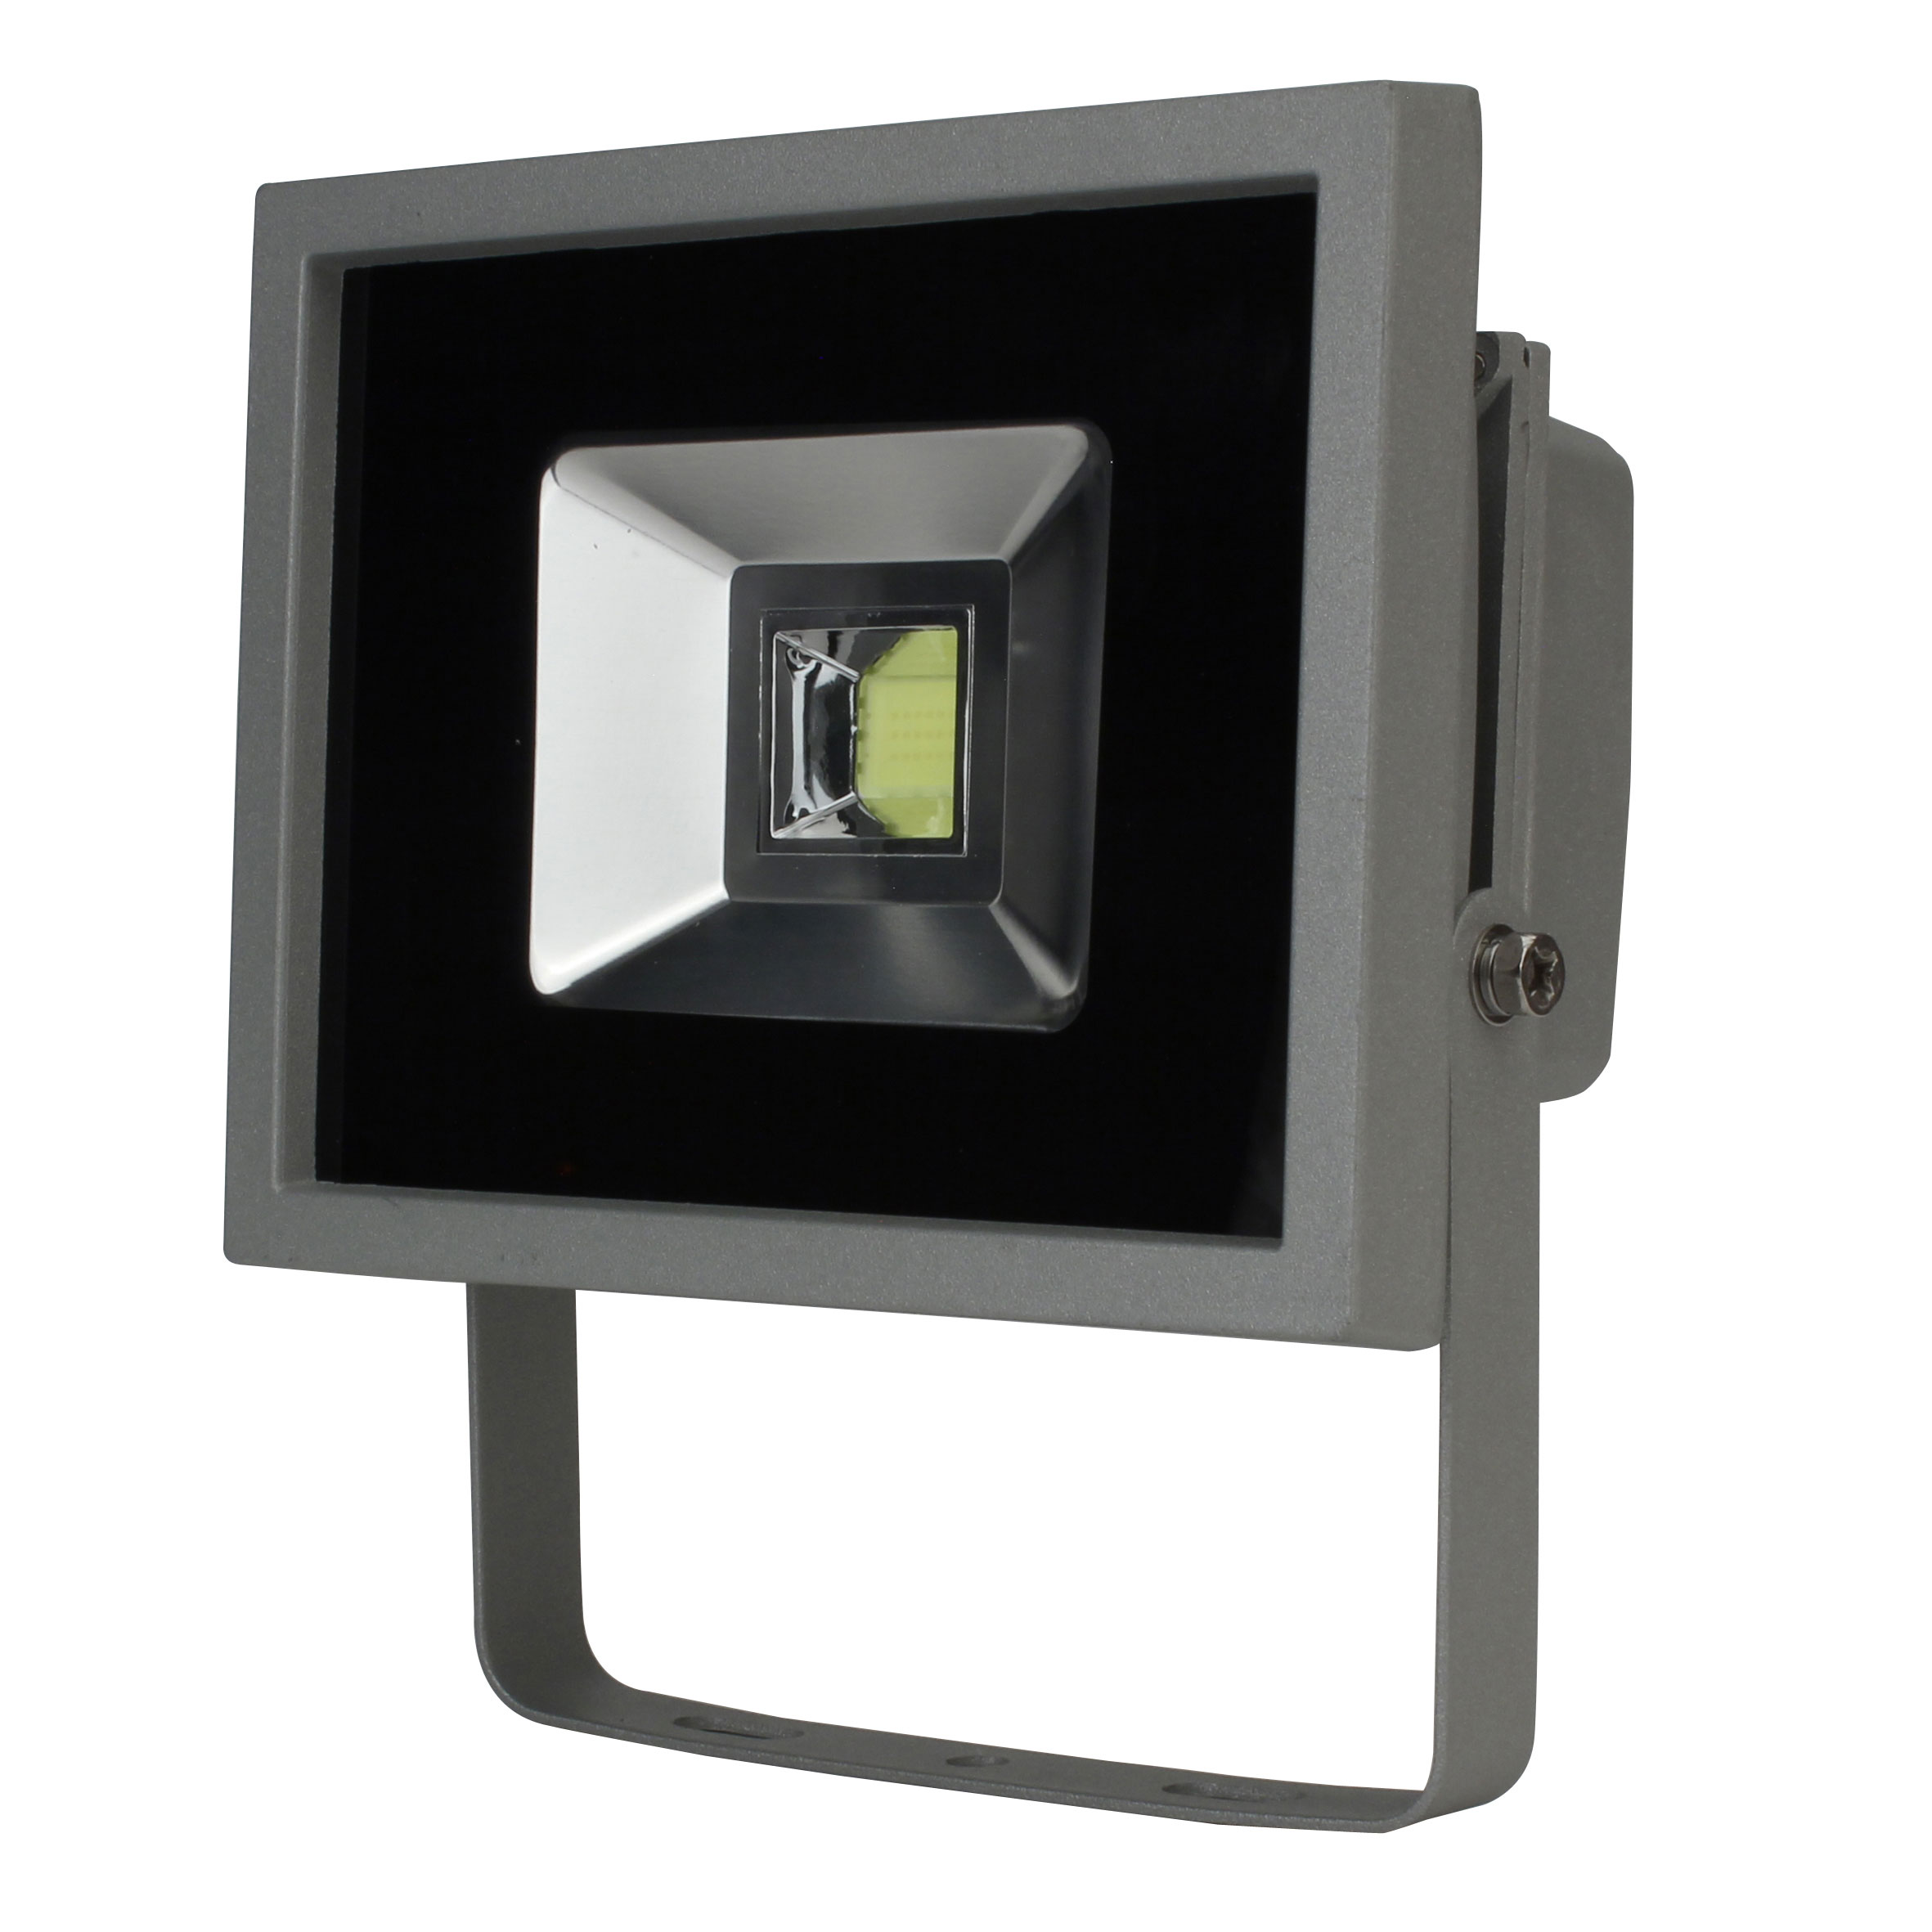 unitec led strahler led fluter ip65 grau 20 watt bei. Black Bedroom Furniture Sets. Home Design Ideas